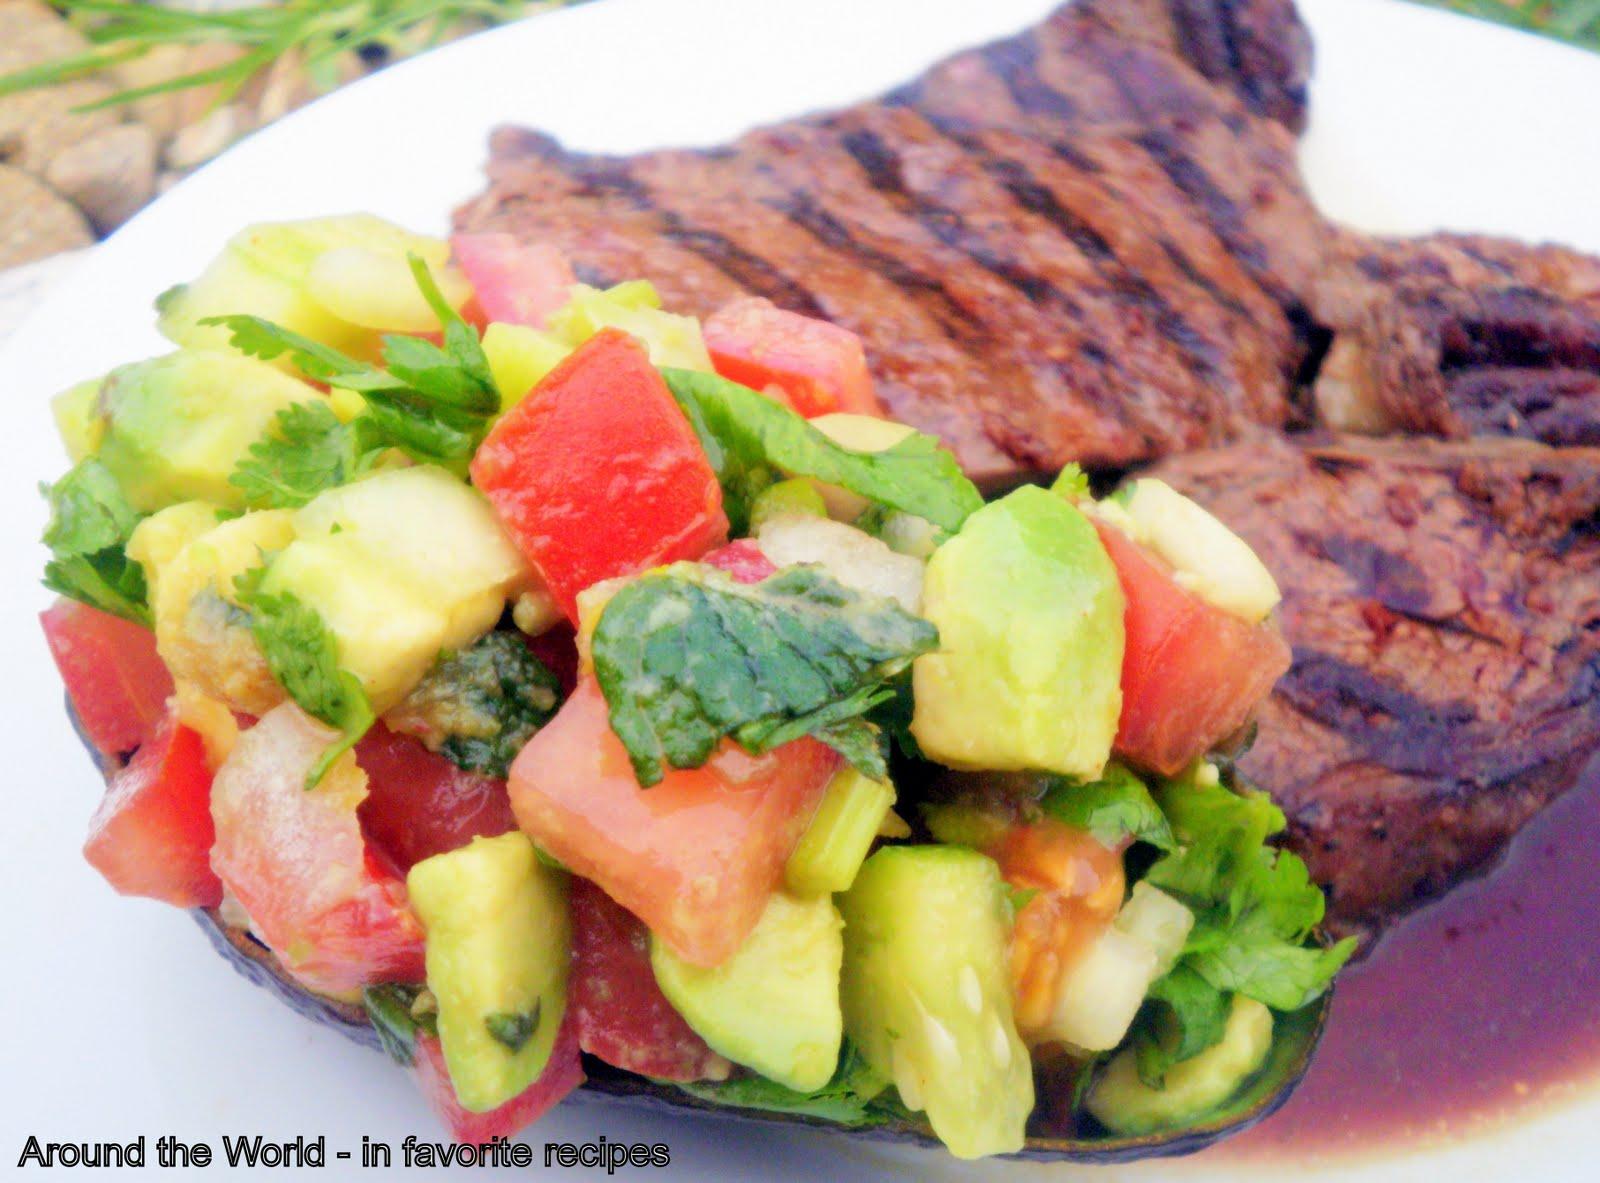 Arabic Salad with Grilled Rump Steak